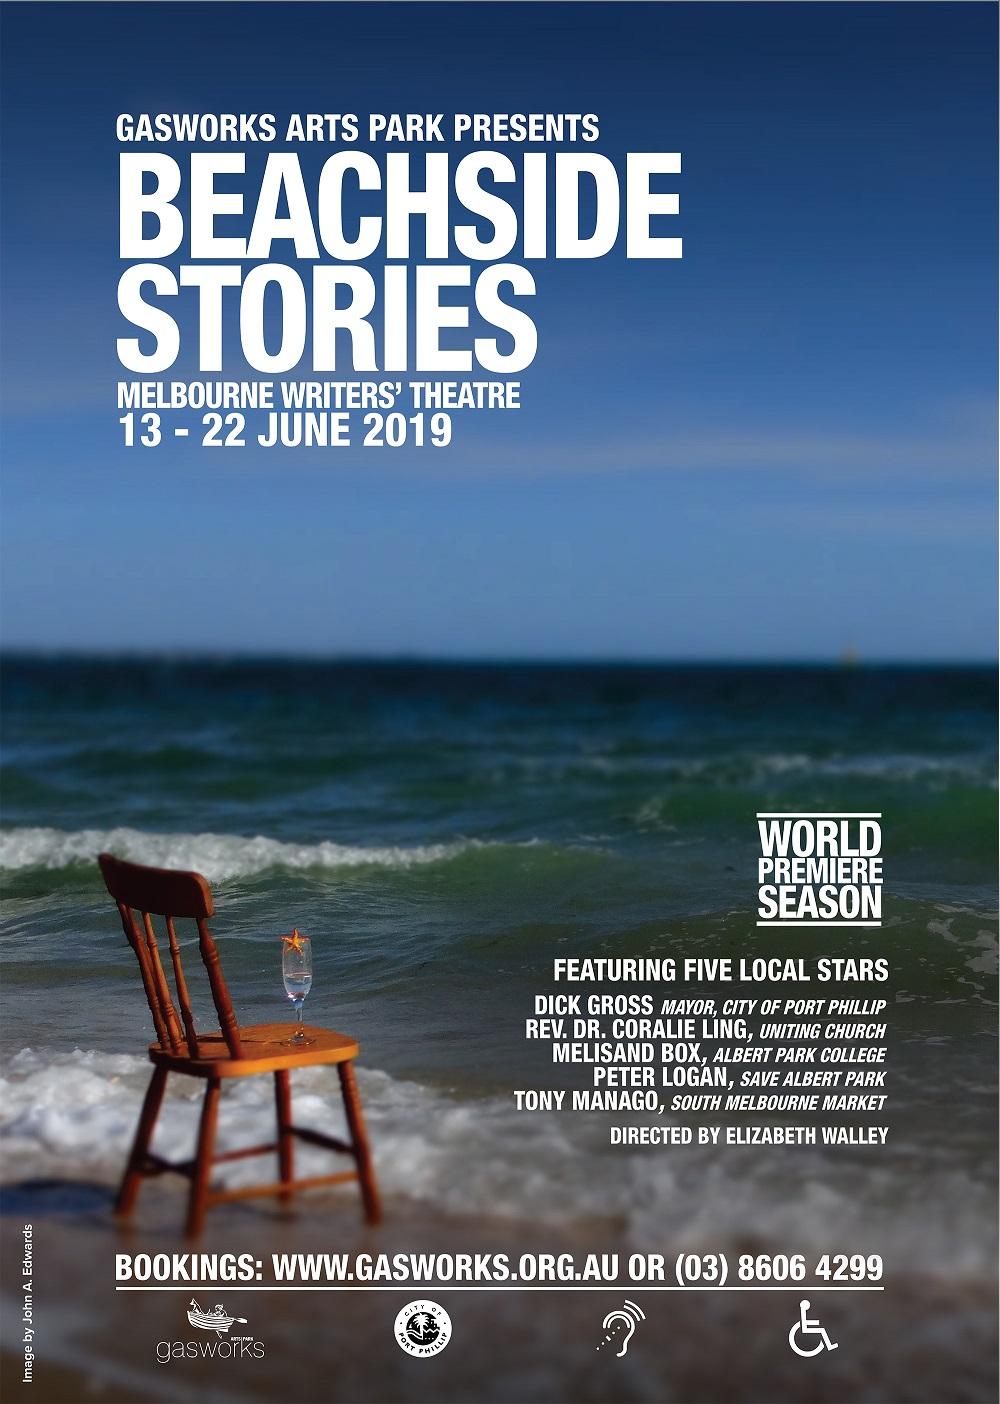 Beachside Stories